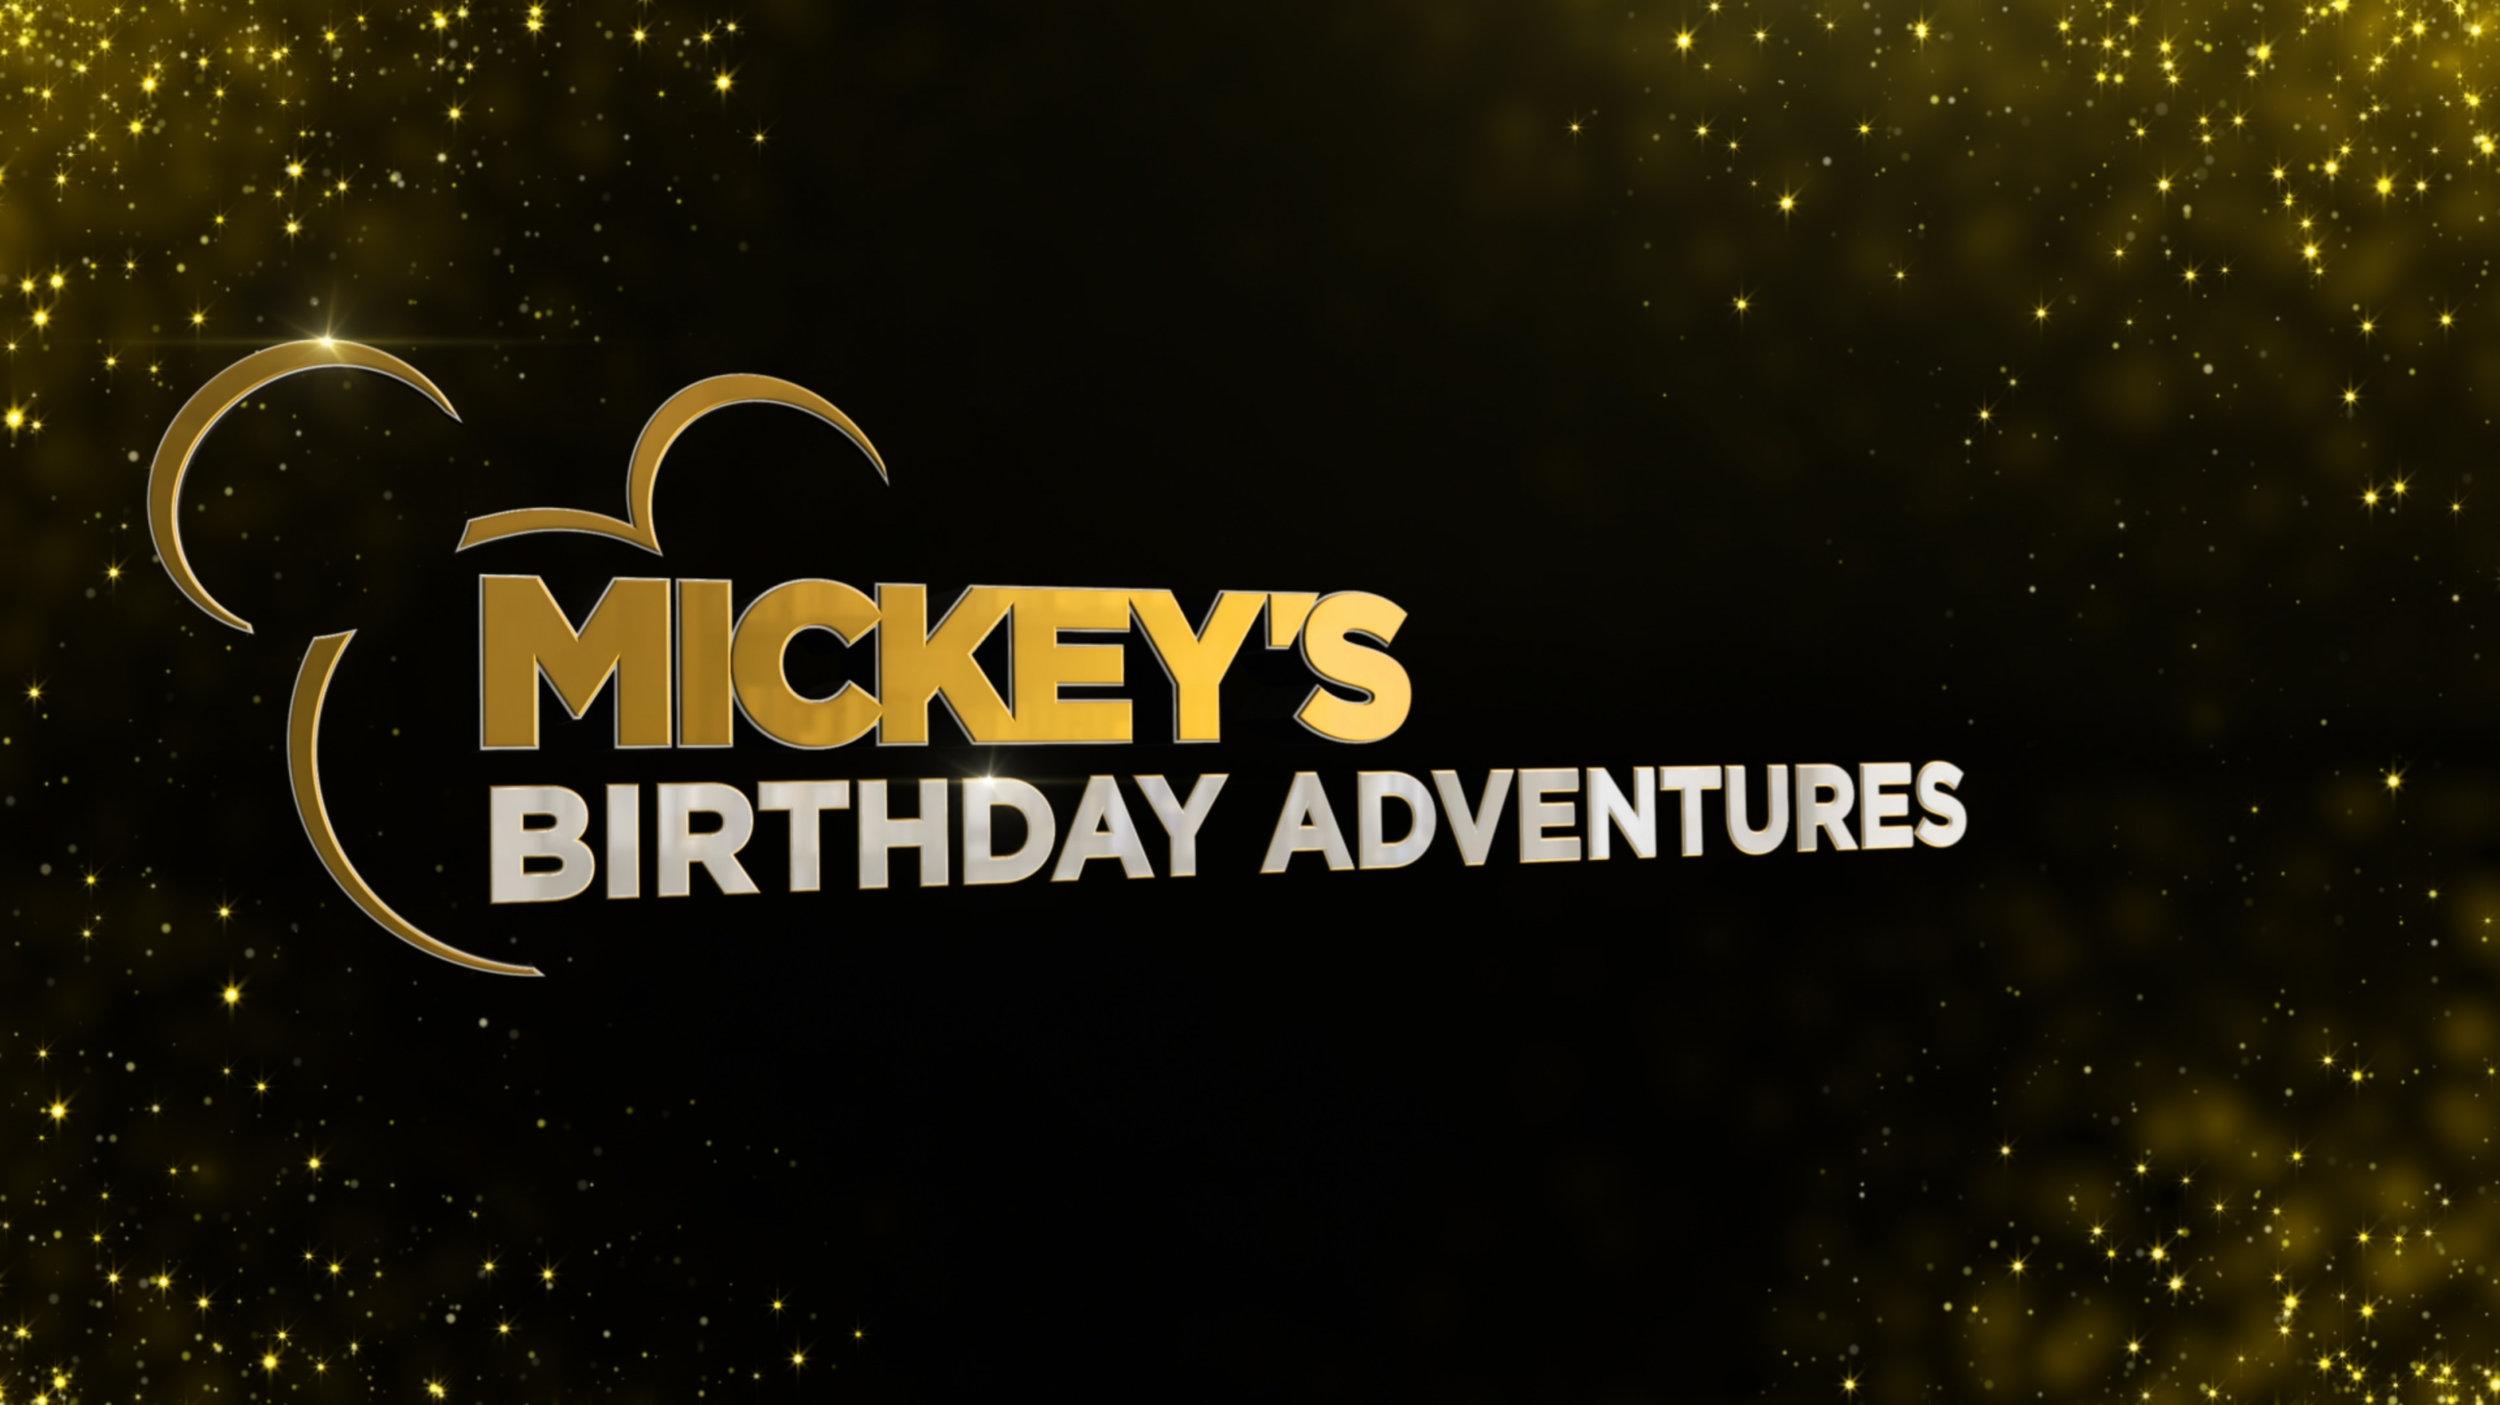 MickeyMouse90_Birthday Adventures.jpg